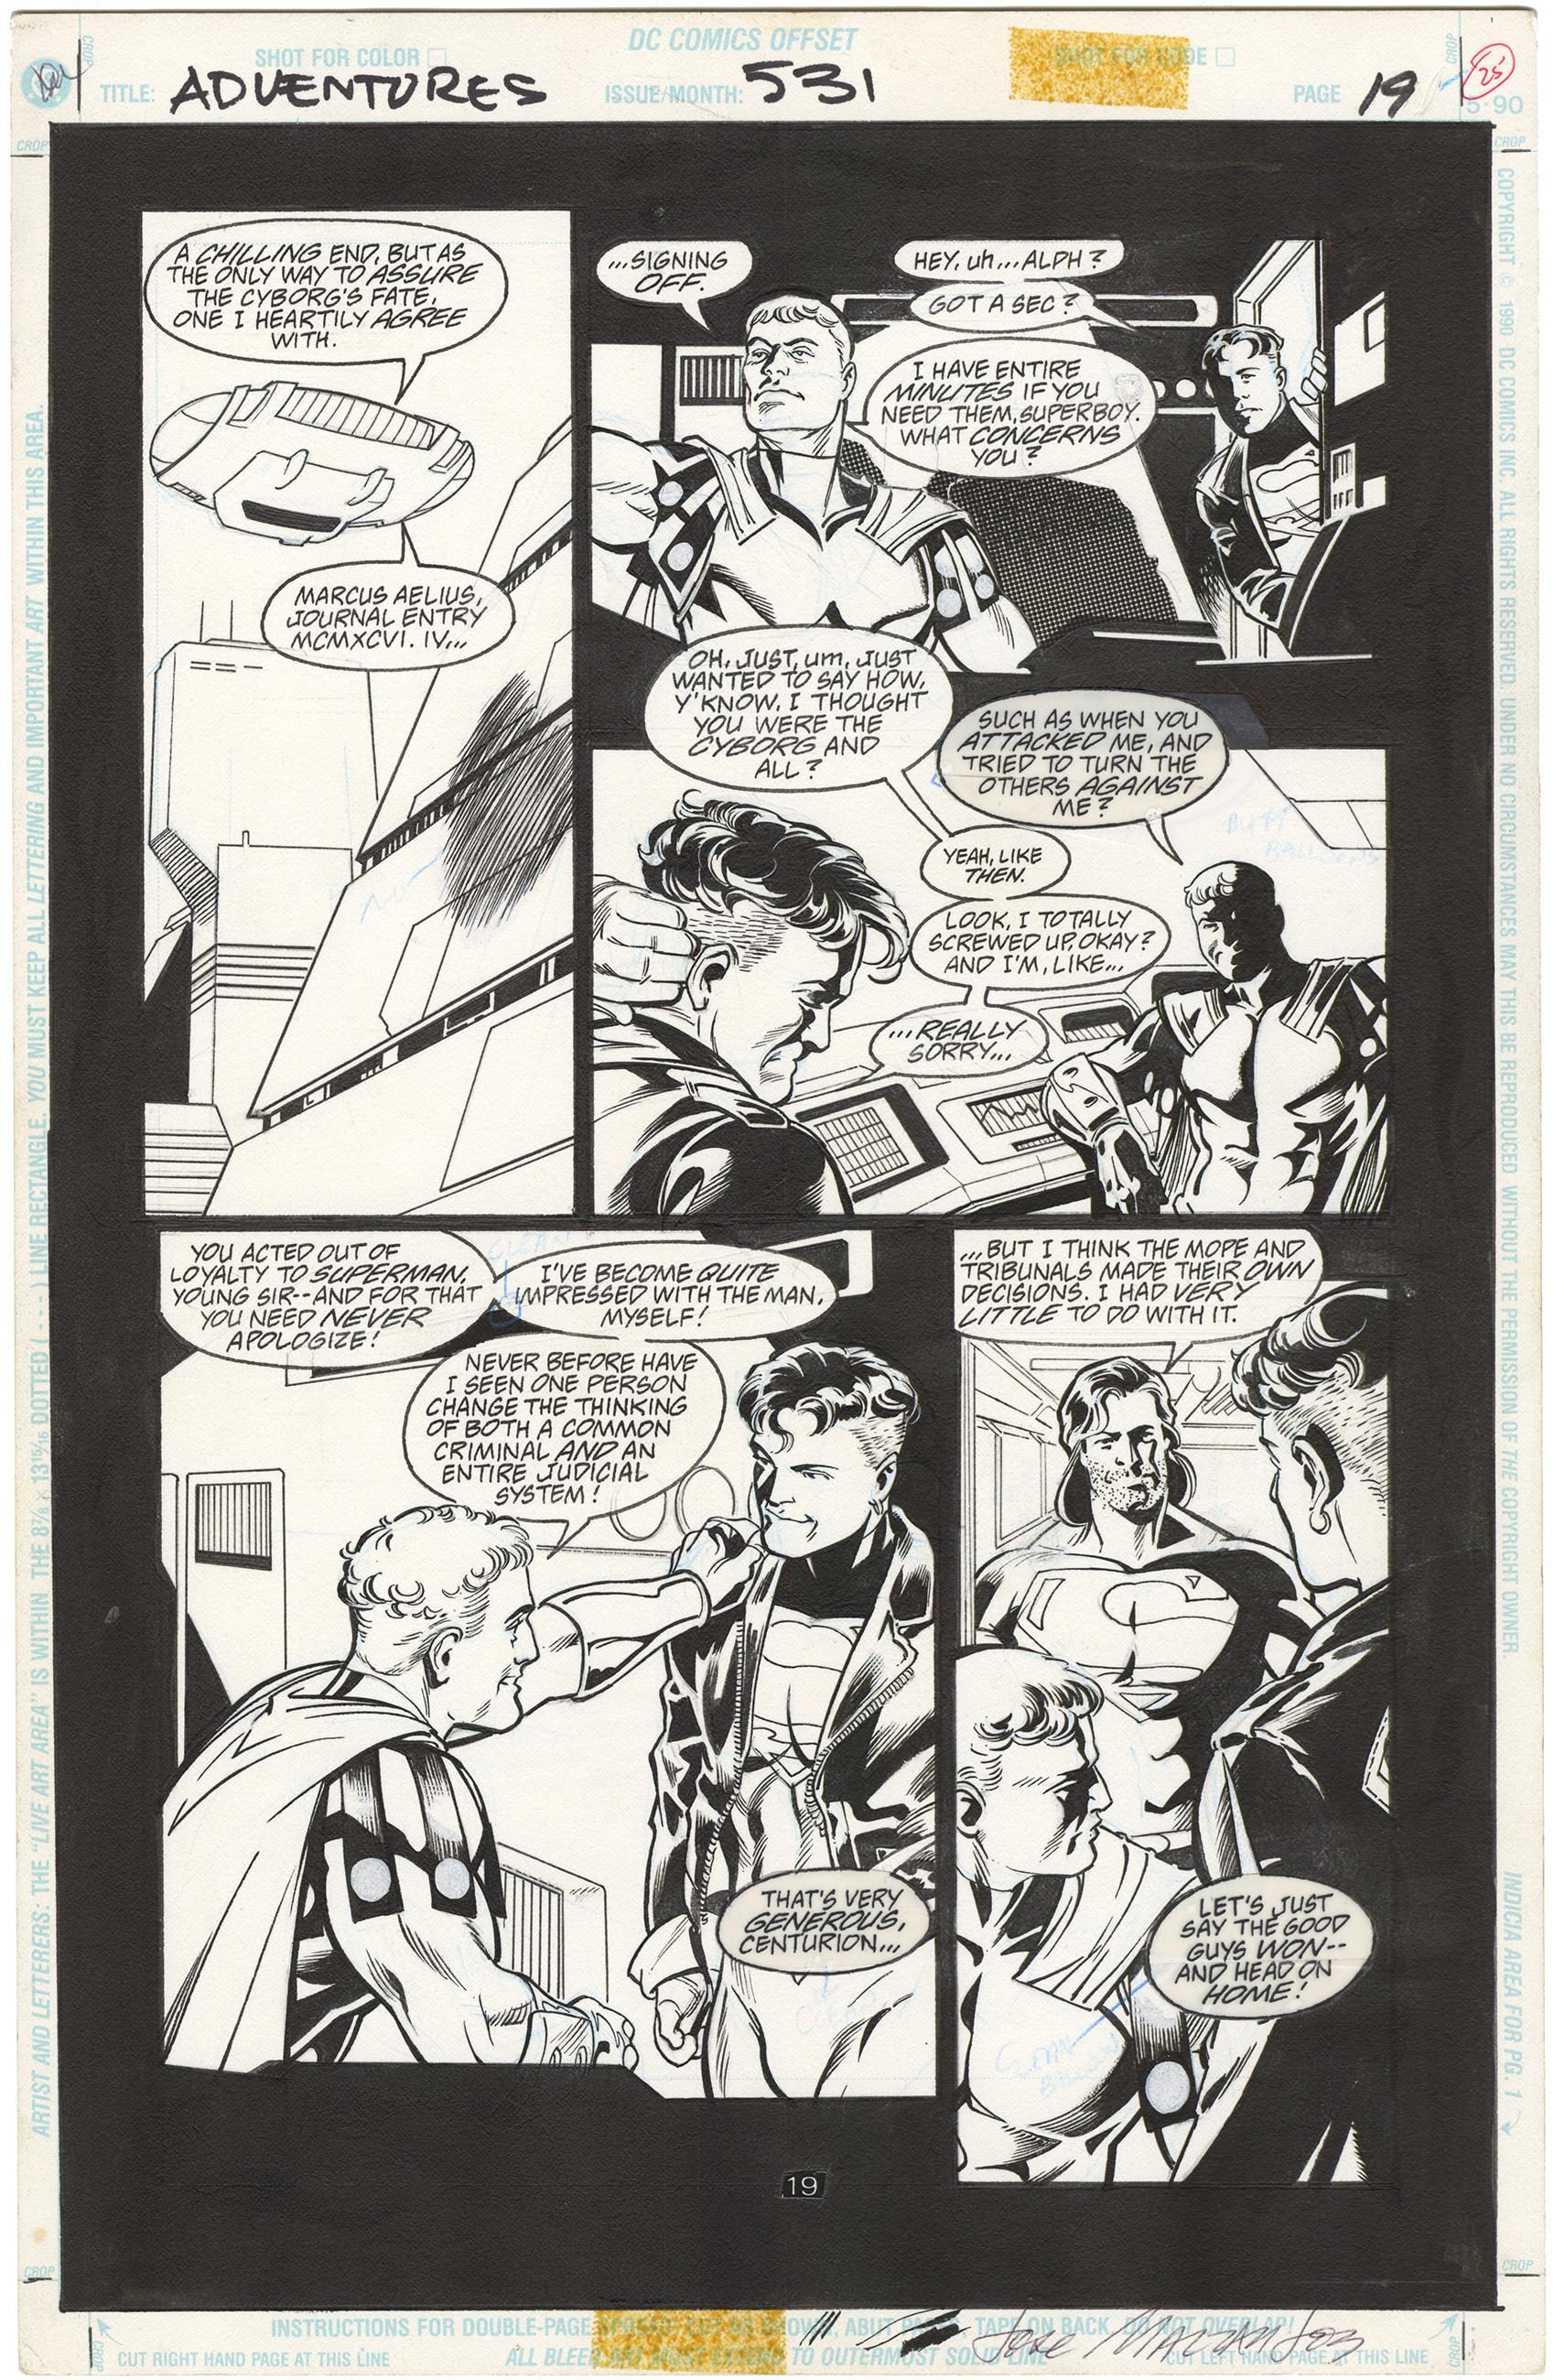 Adventures of Superman #531 p19